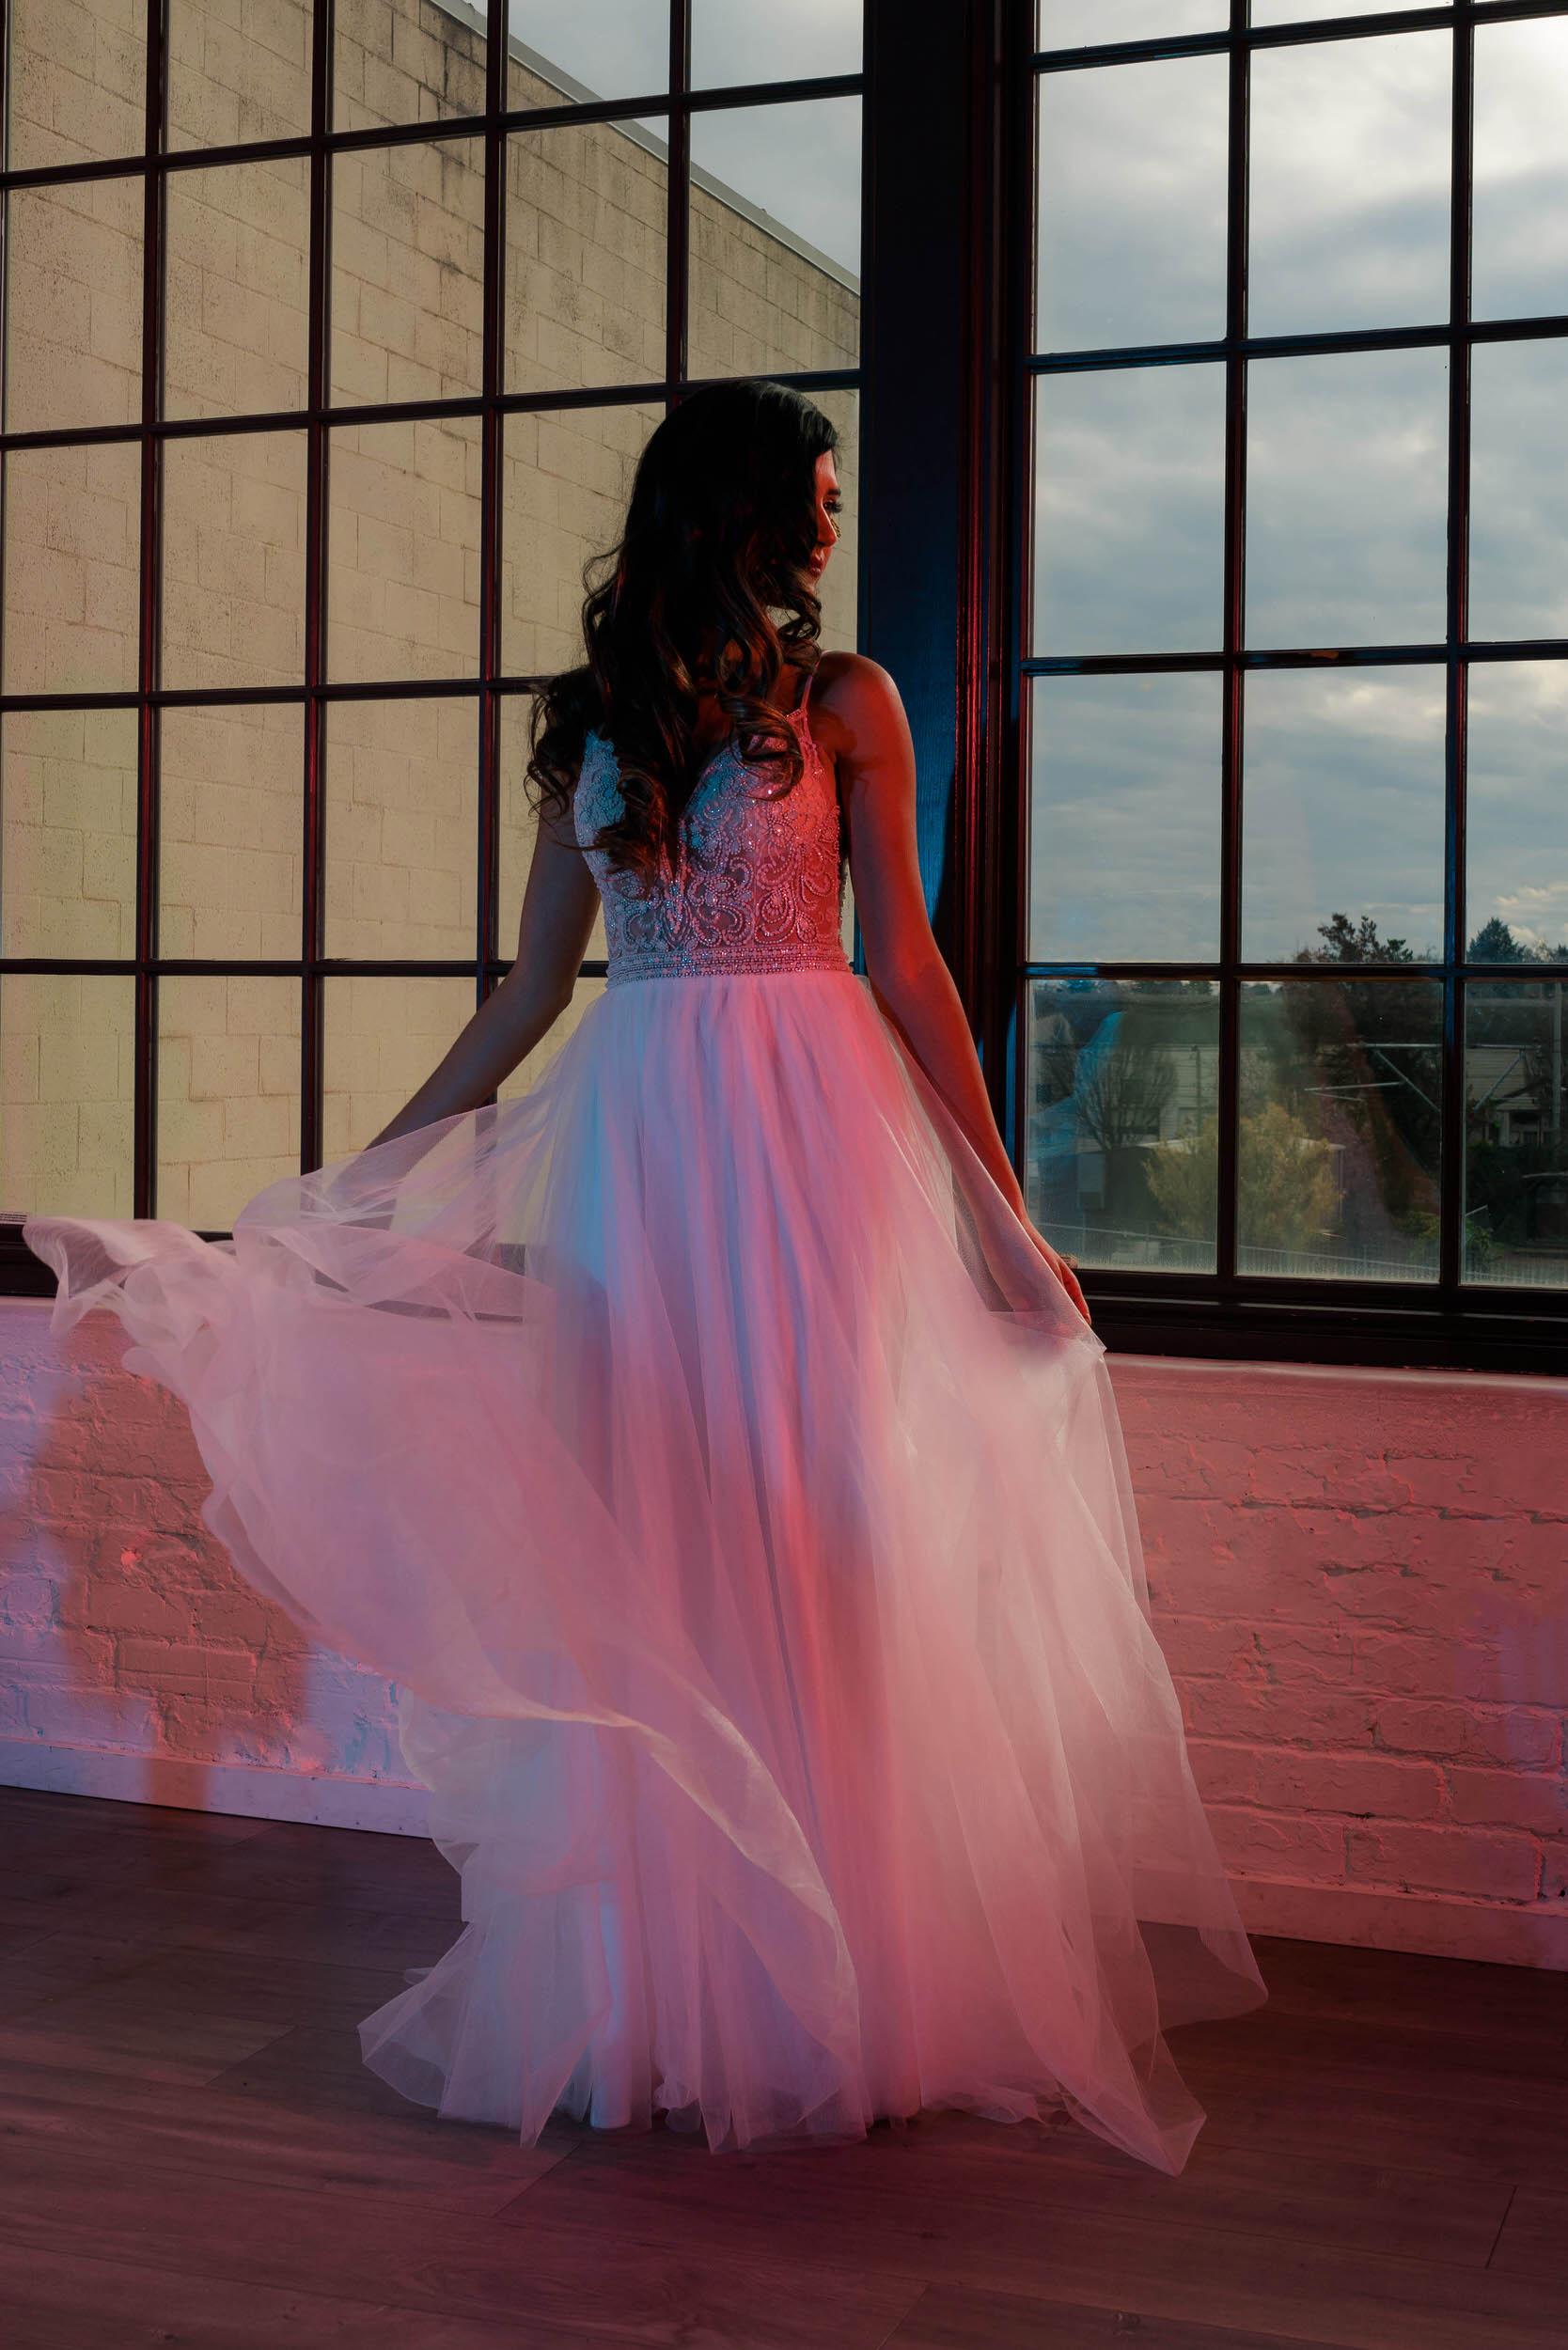 oregon-city-wedding-photography-2.jpg